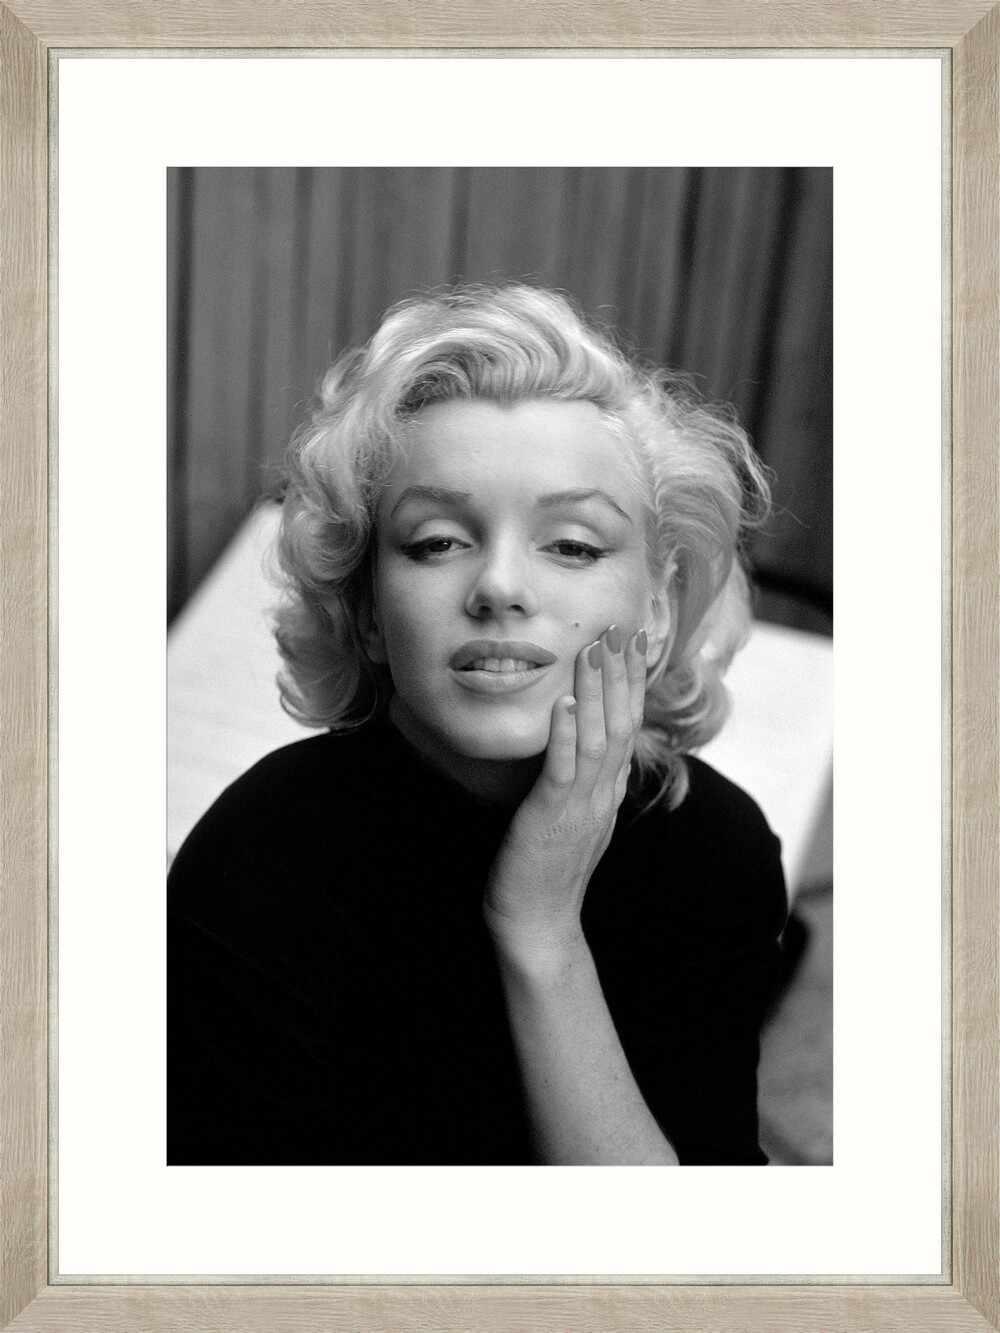 Tablou Framed Art Marilyn Melancholic la pret 436 lei